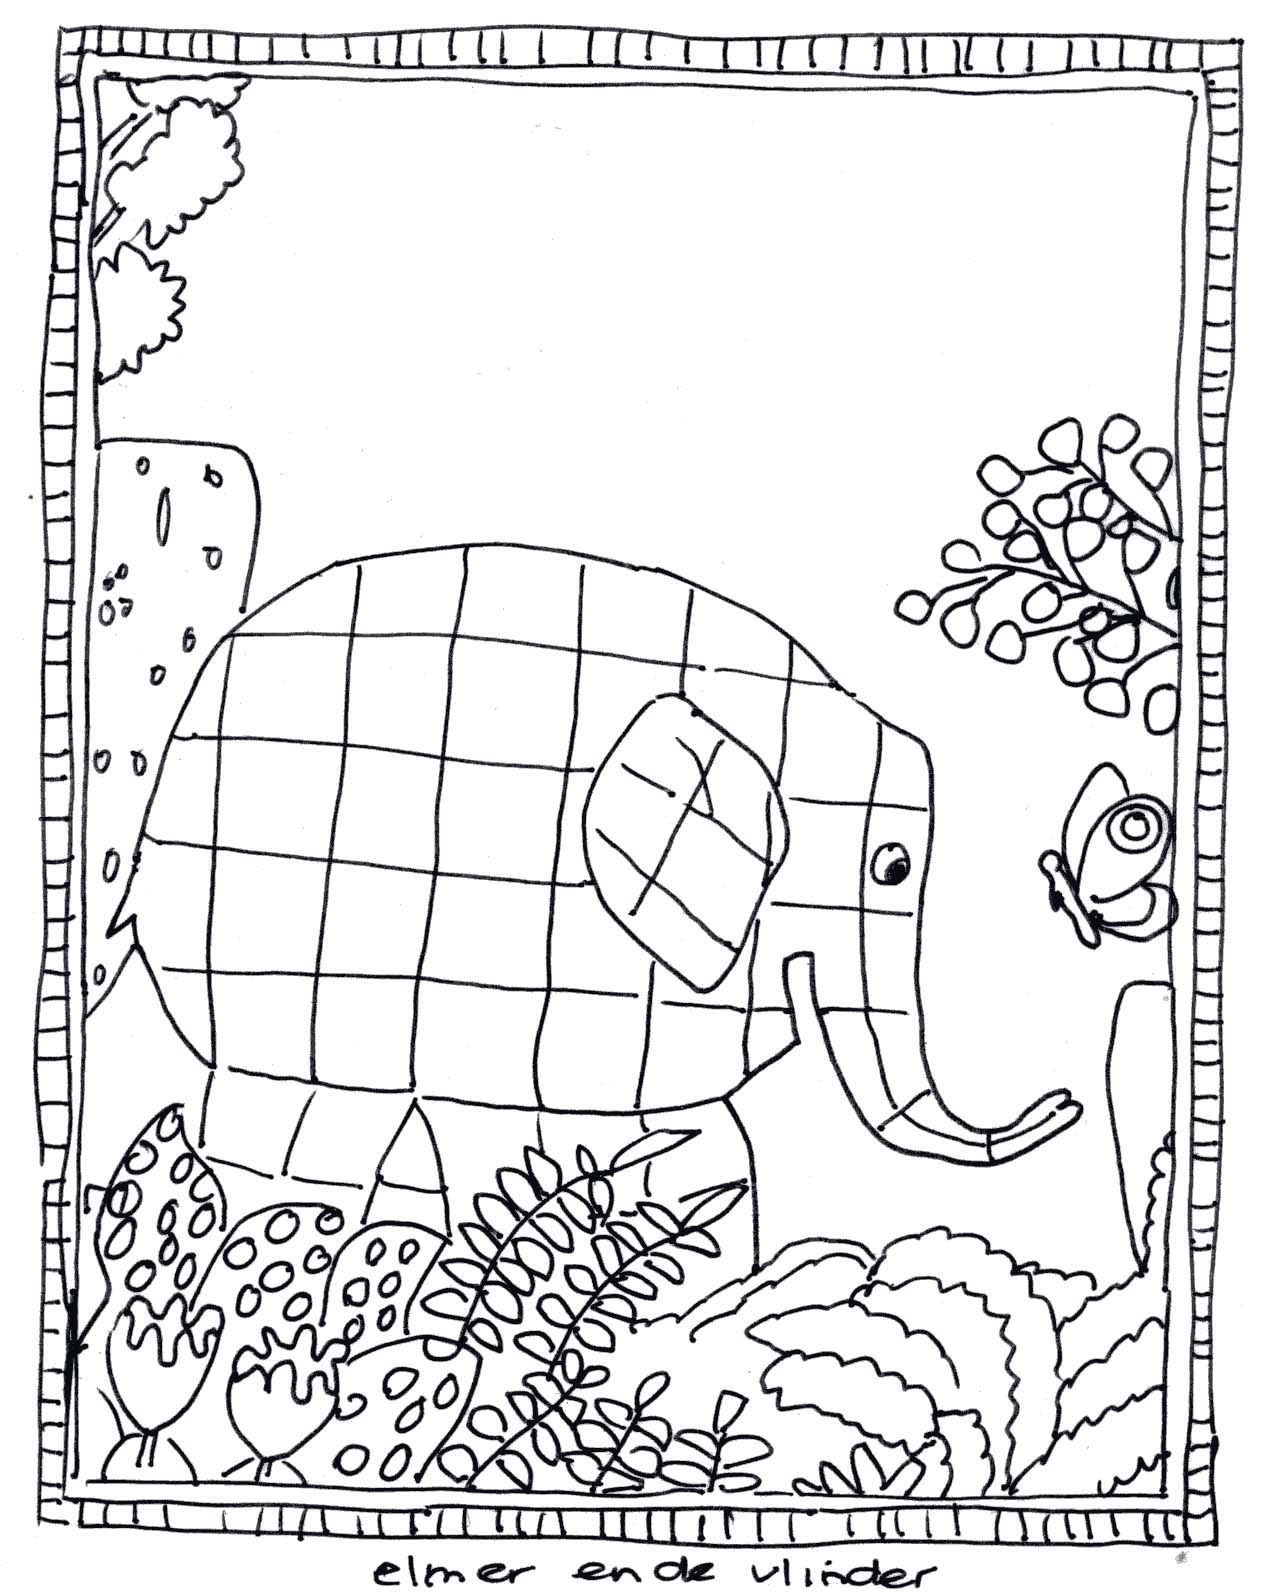 pin karin roosendaal op kleurplaten en werkbladen